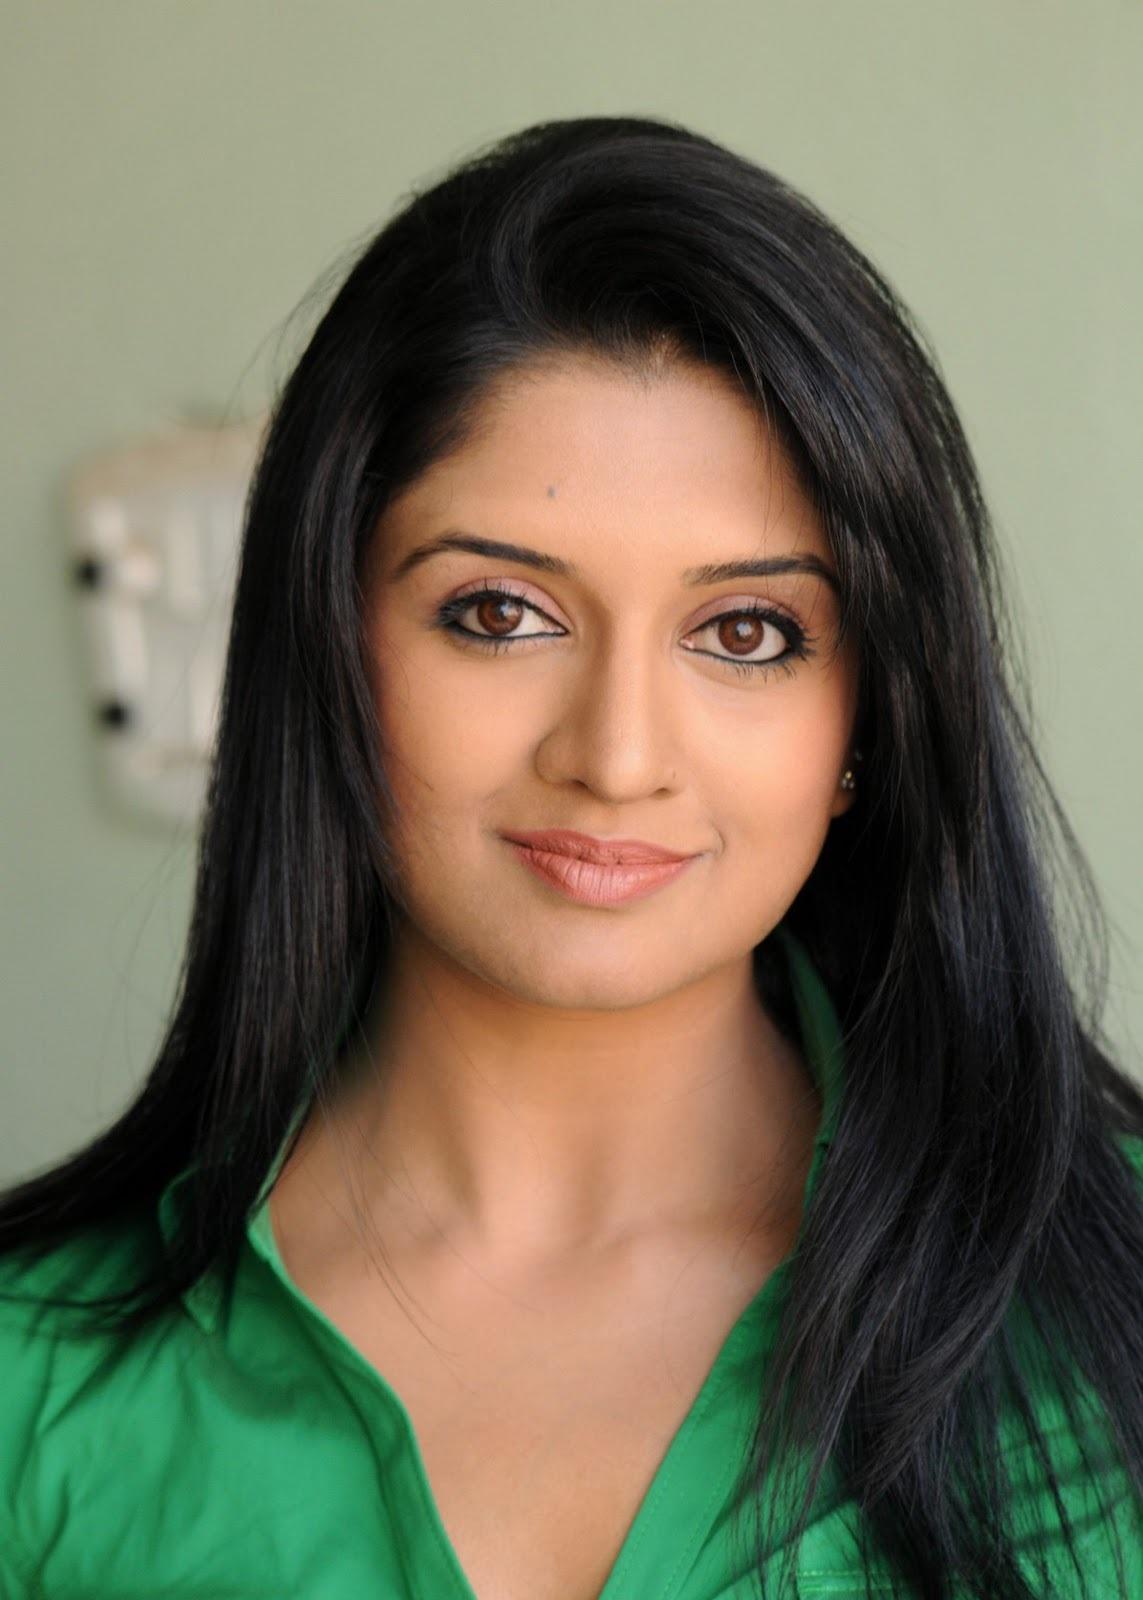 Vimala Raman hot looking pics